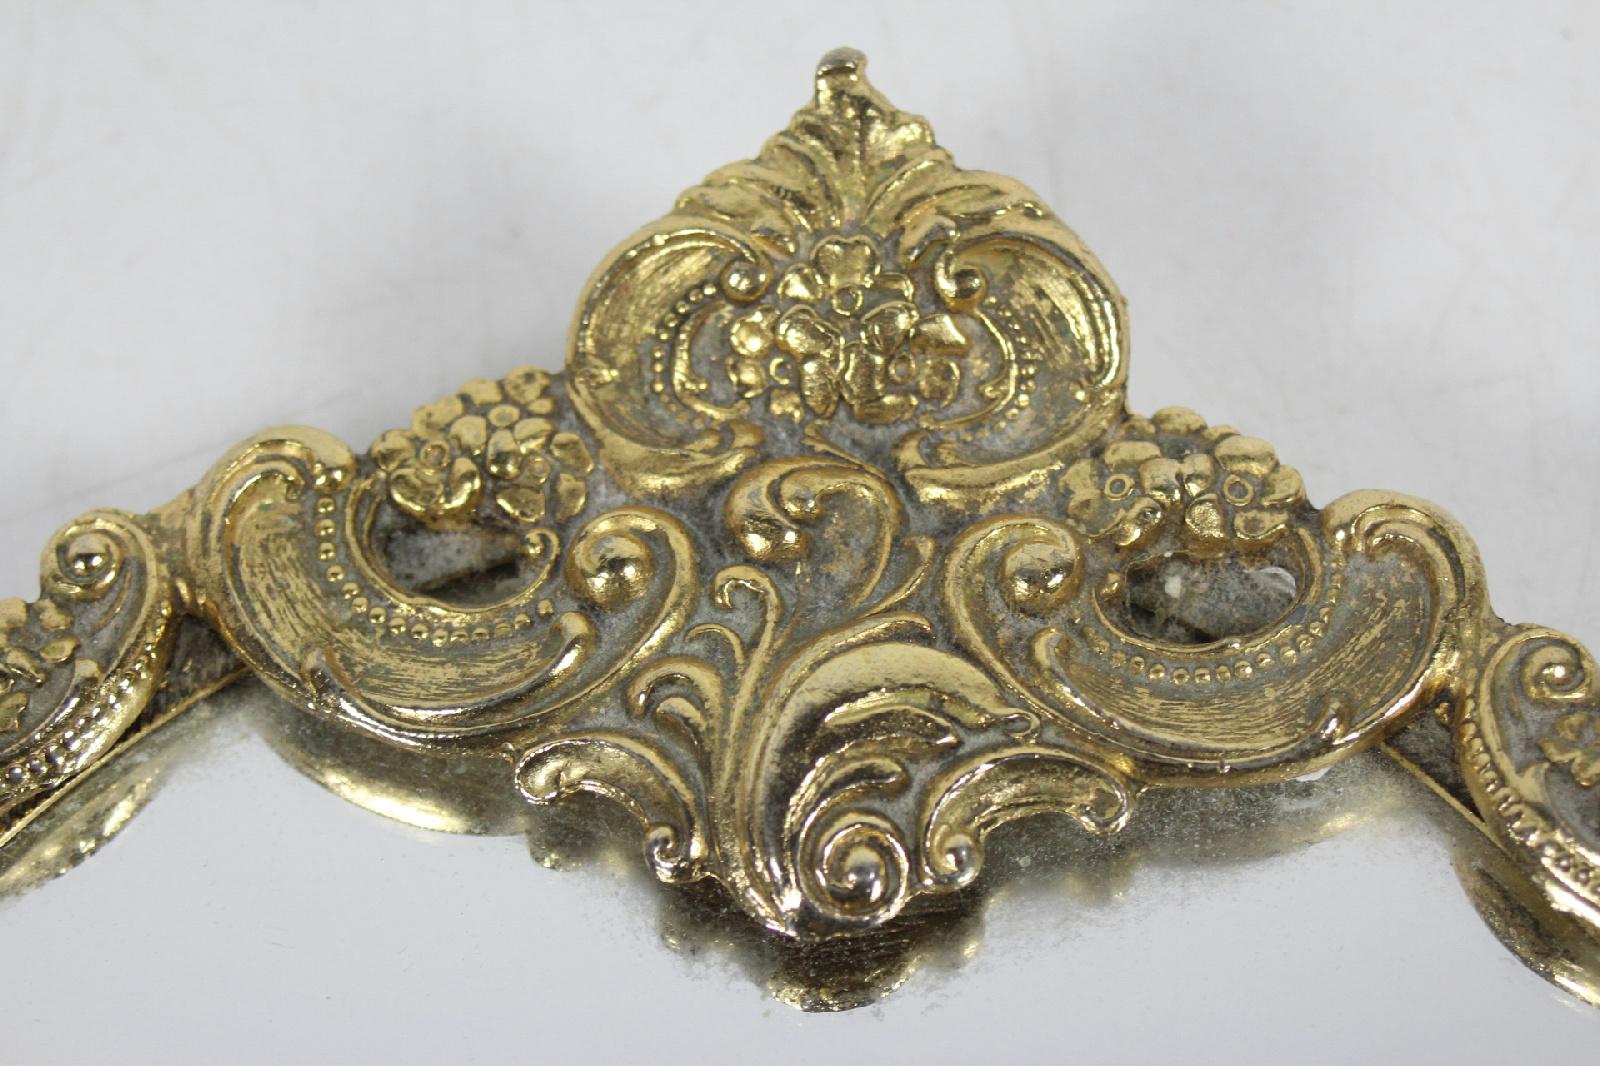 Vintage Ornate Decorative Brass Gold Tone Mirror Vanity